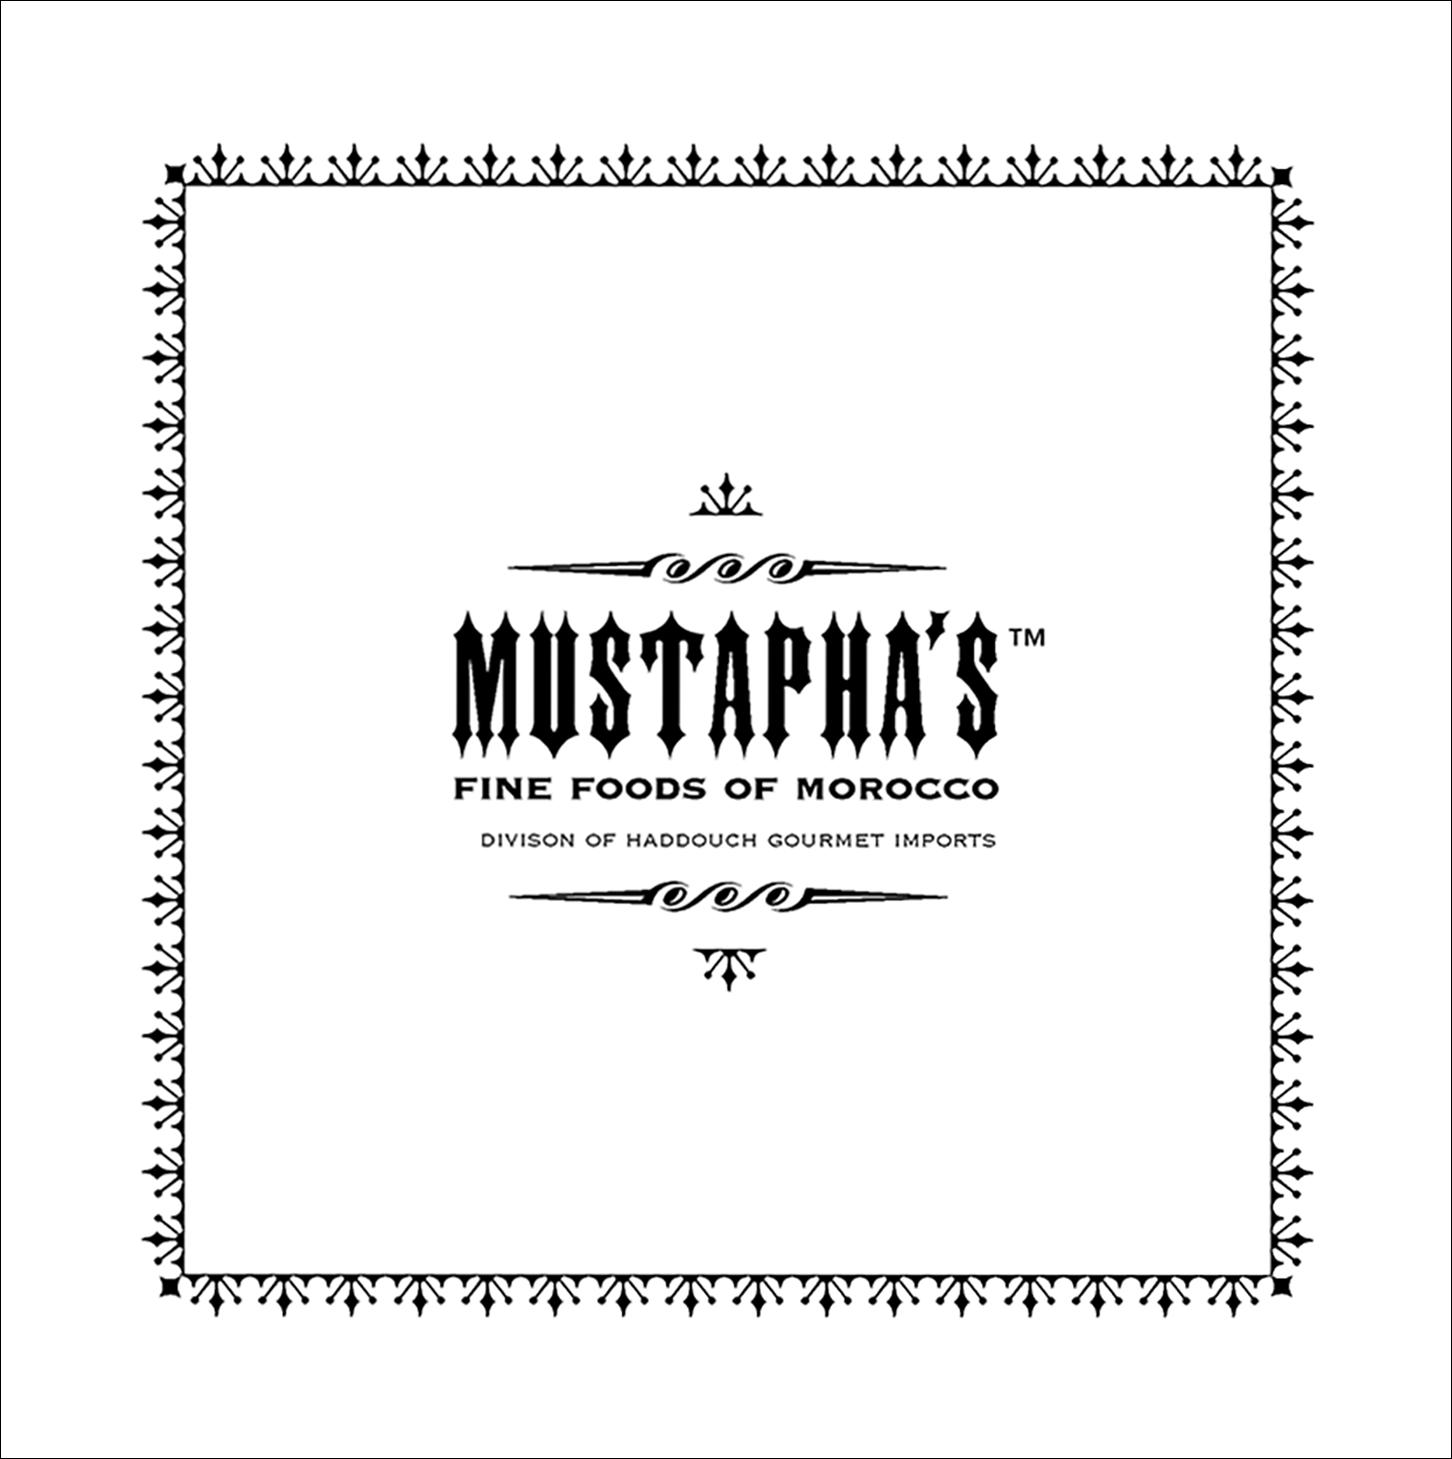 mustapha-logo copy.png